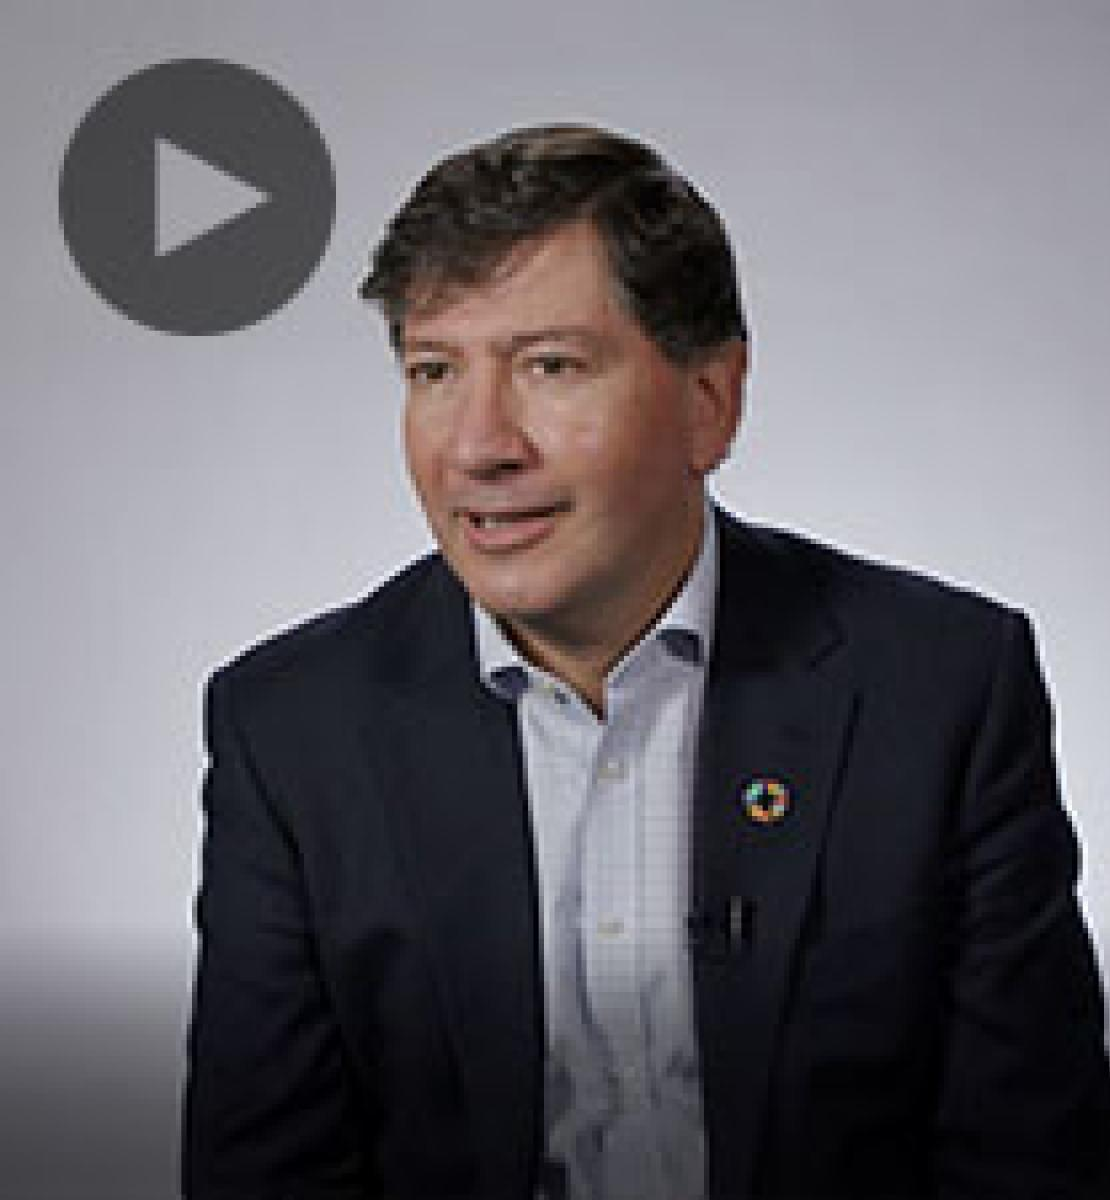 Screenshot from video message shows Resident Coordinator, Igor Garafulic